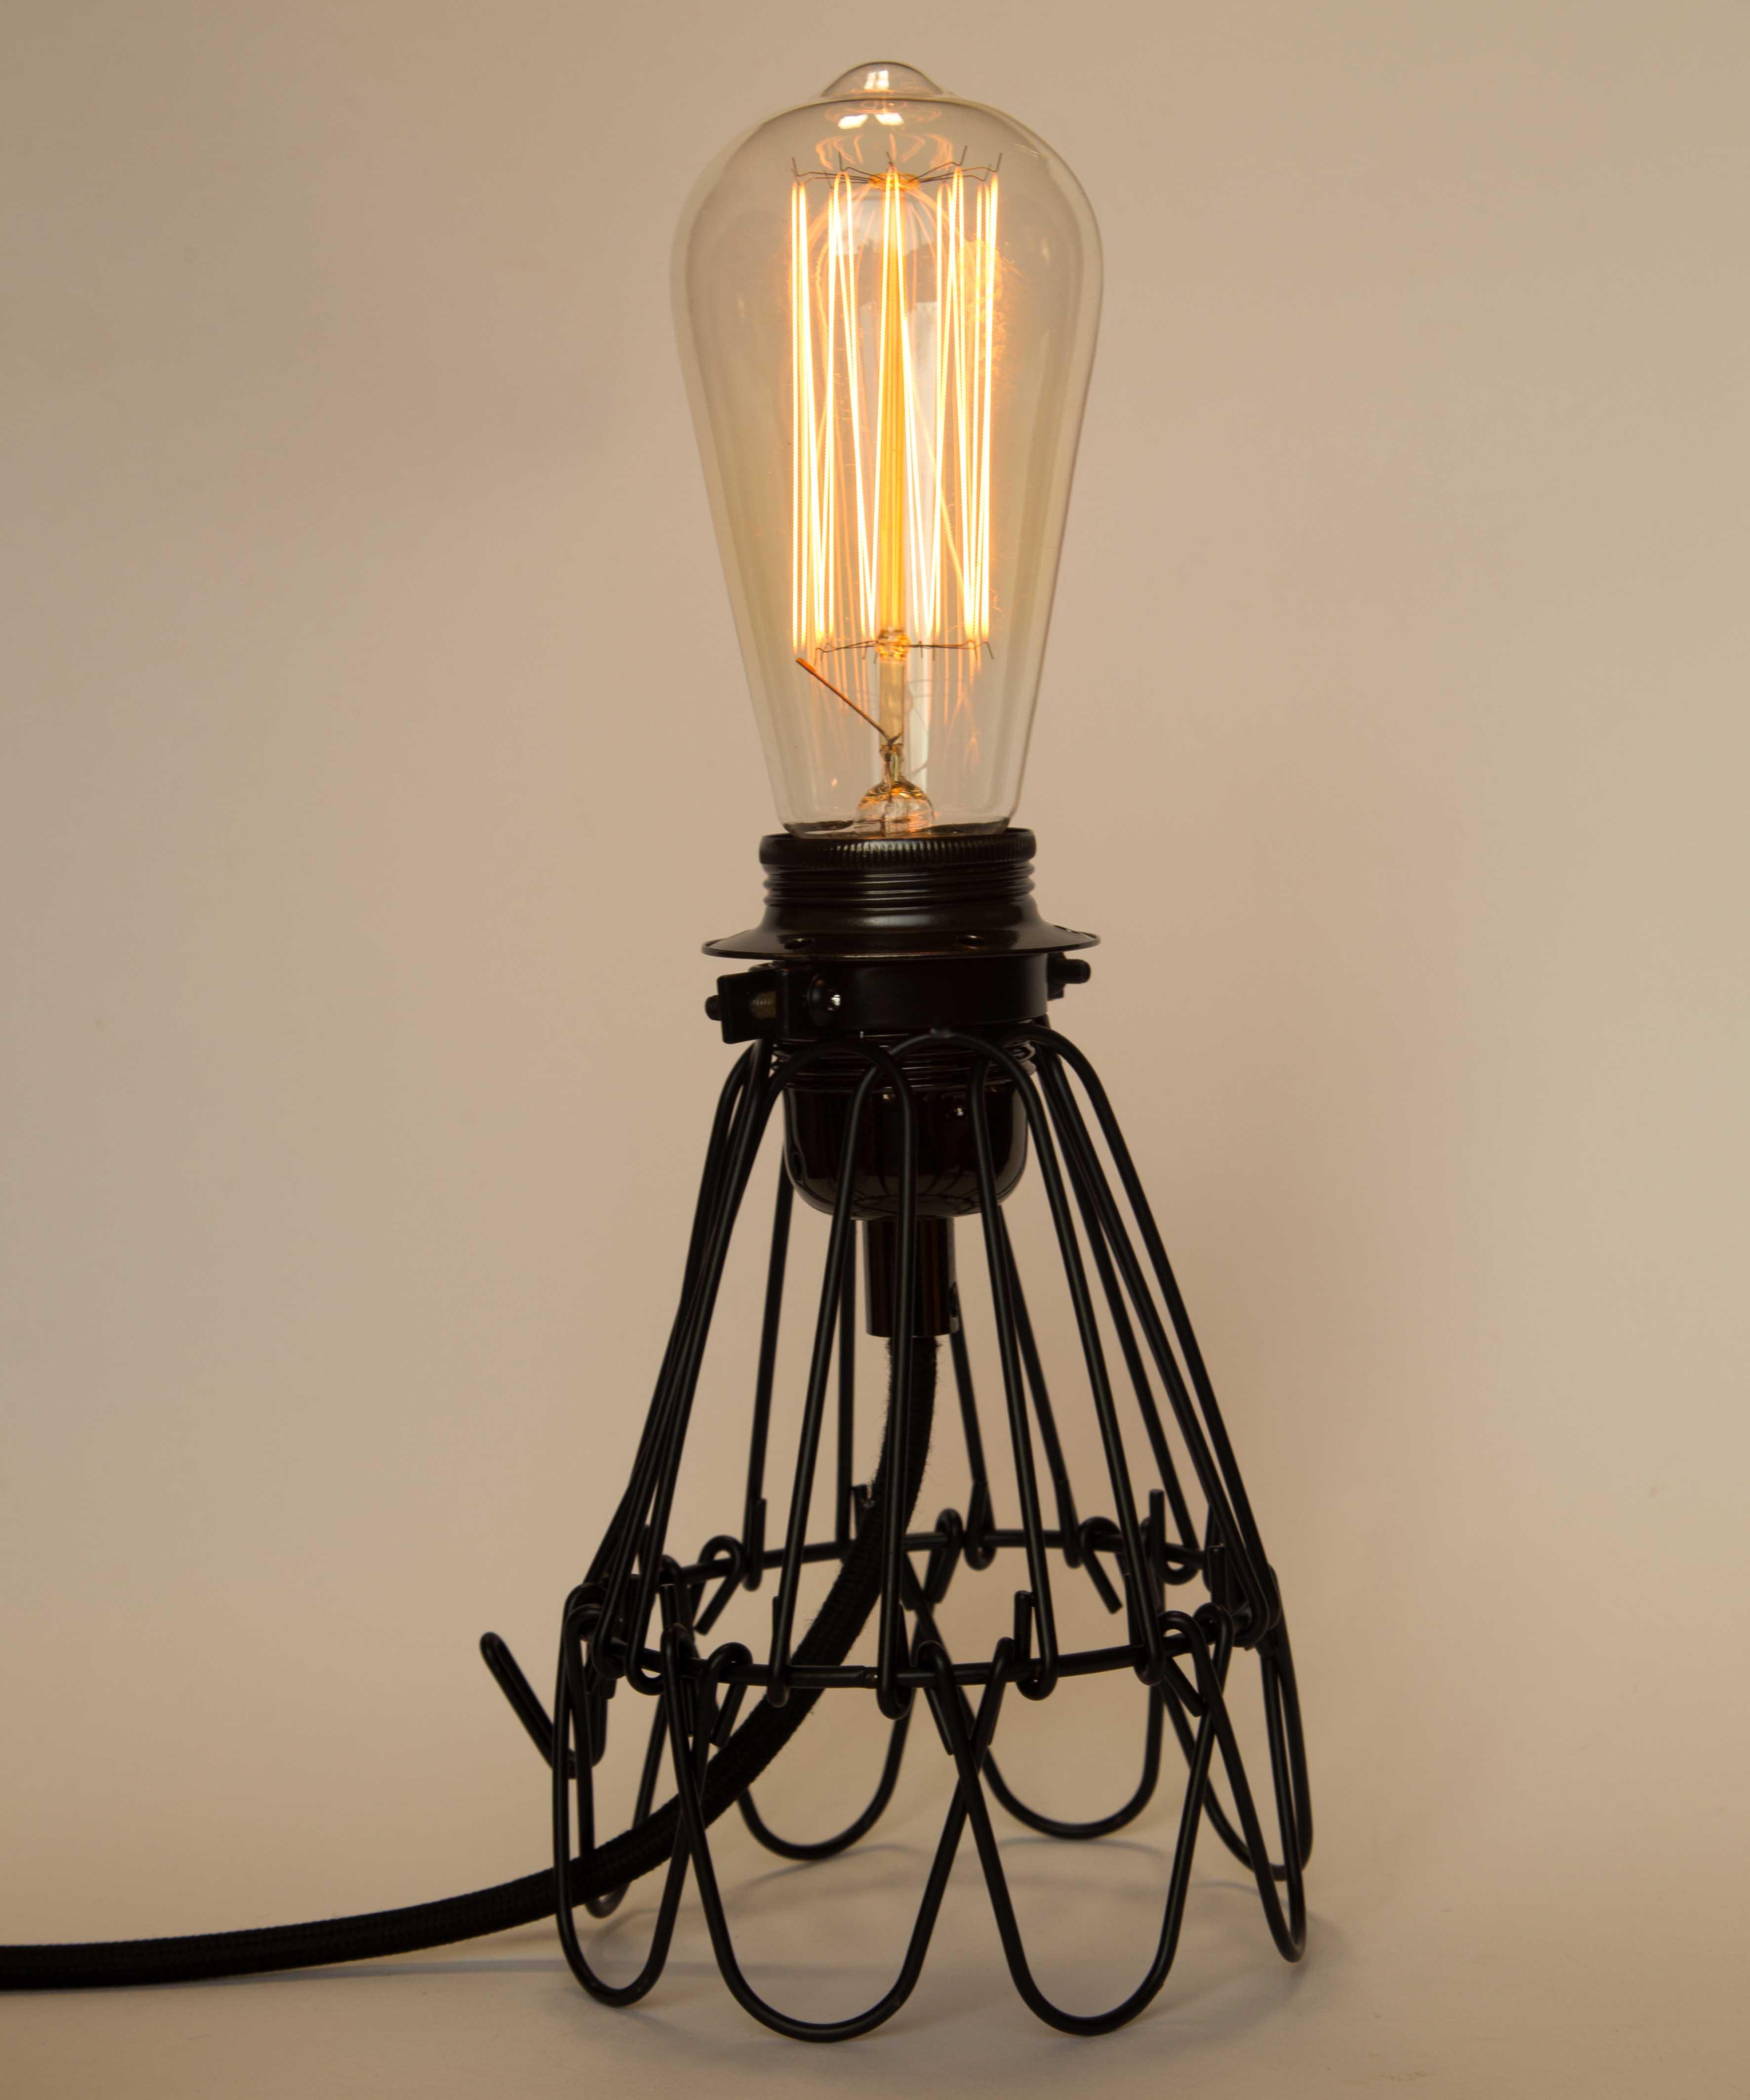 Cage Lamp Italian Retro Design Dimmable Pendant Bedside